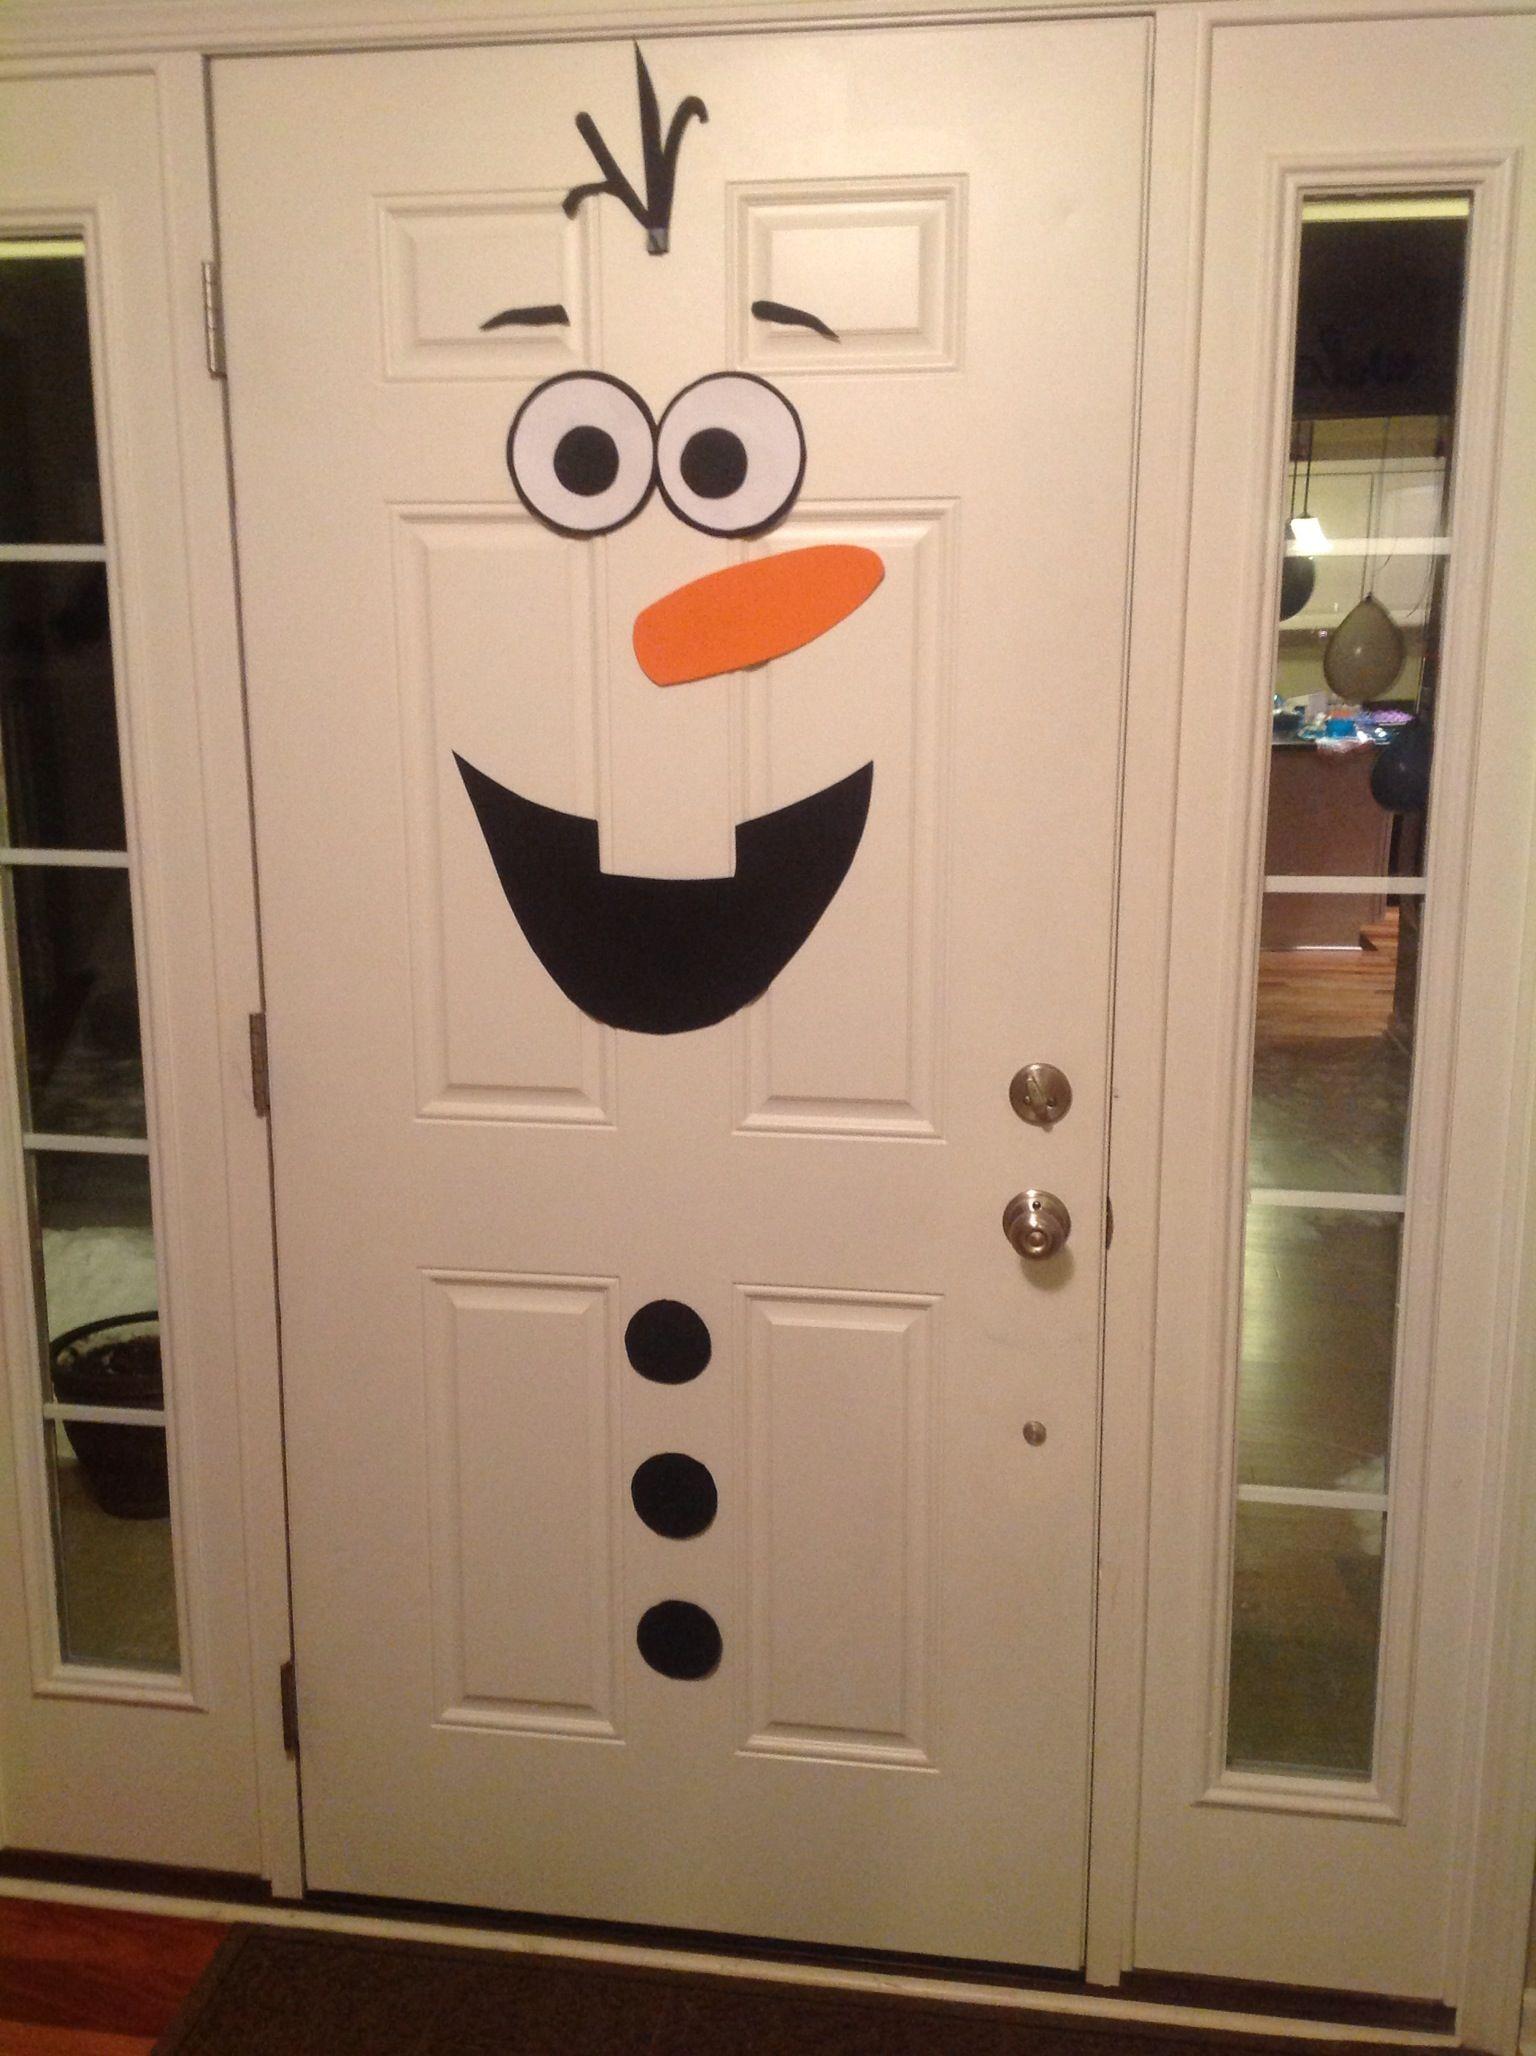 #B74614 Winter Door Decoration Olaf From Frozen Weown In S MEMES 6461 Décoration Noel Olaf 1536x2056 px @ aertt.com